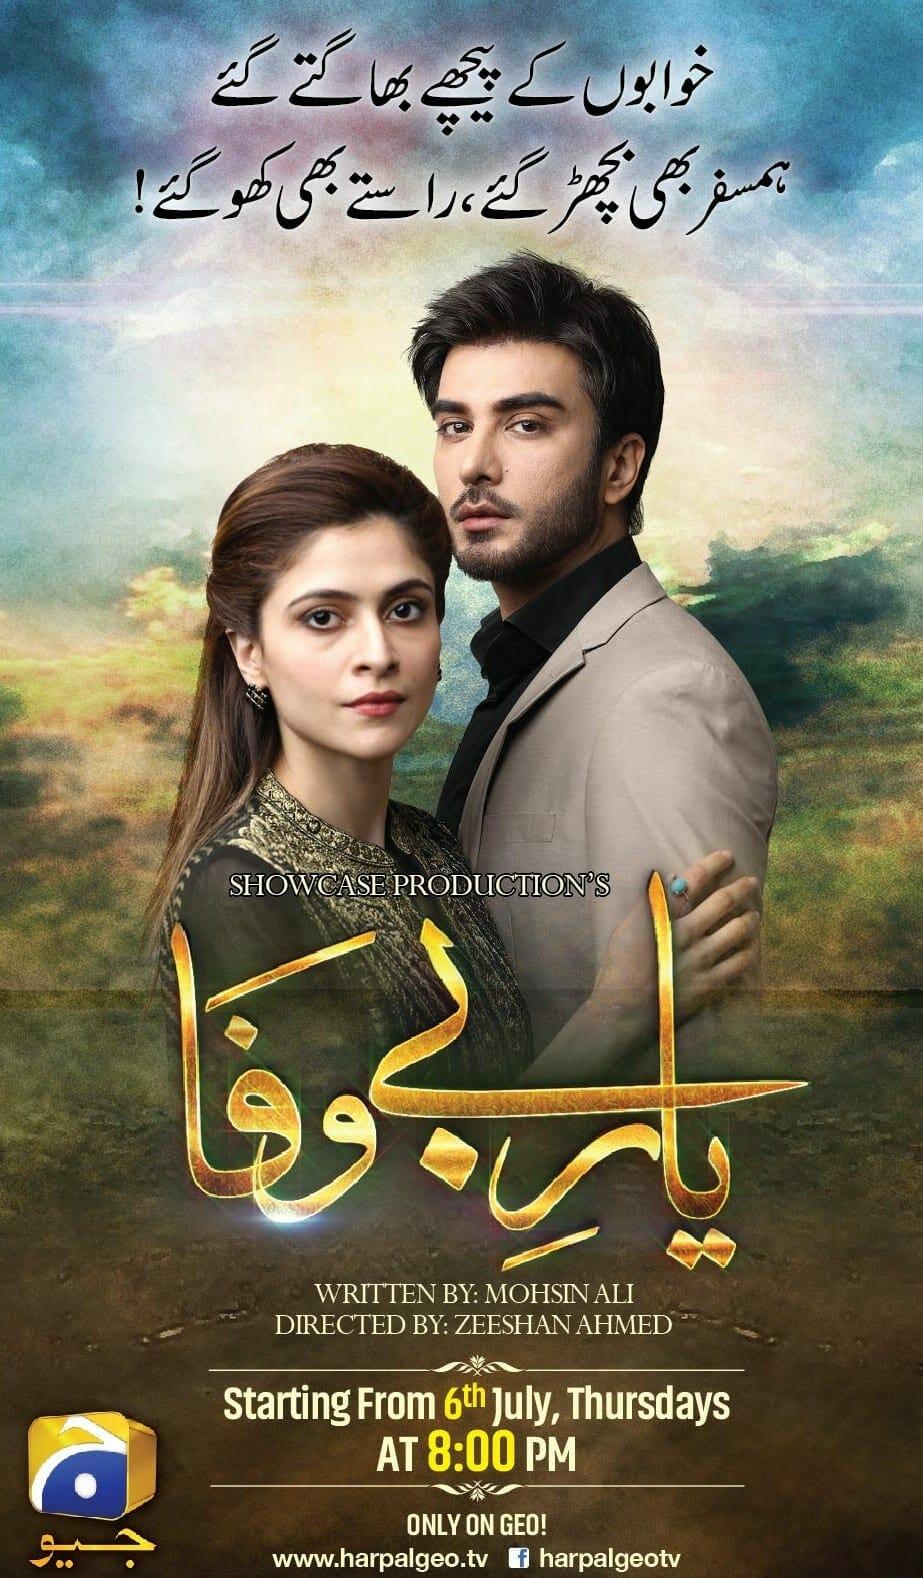 Yaar e Bewafa - Bored? Here are Top 10 Pakistani Dramas of 2017 to Watch